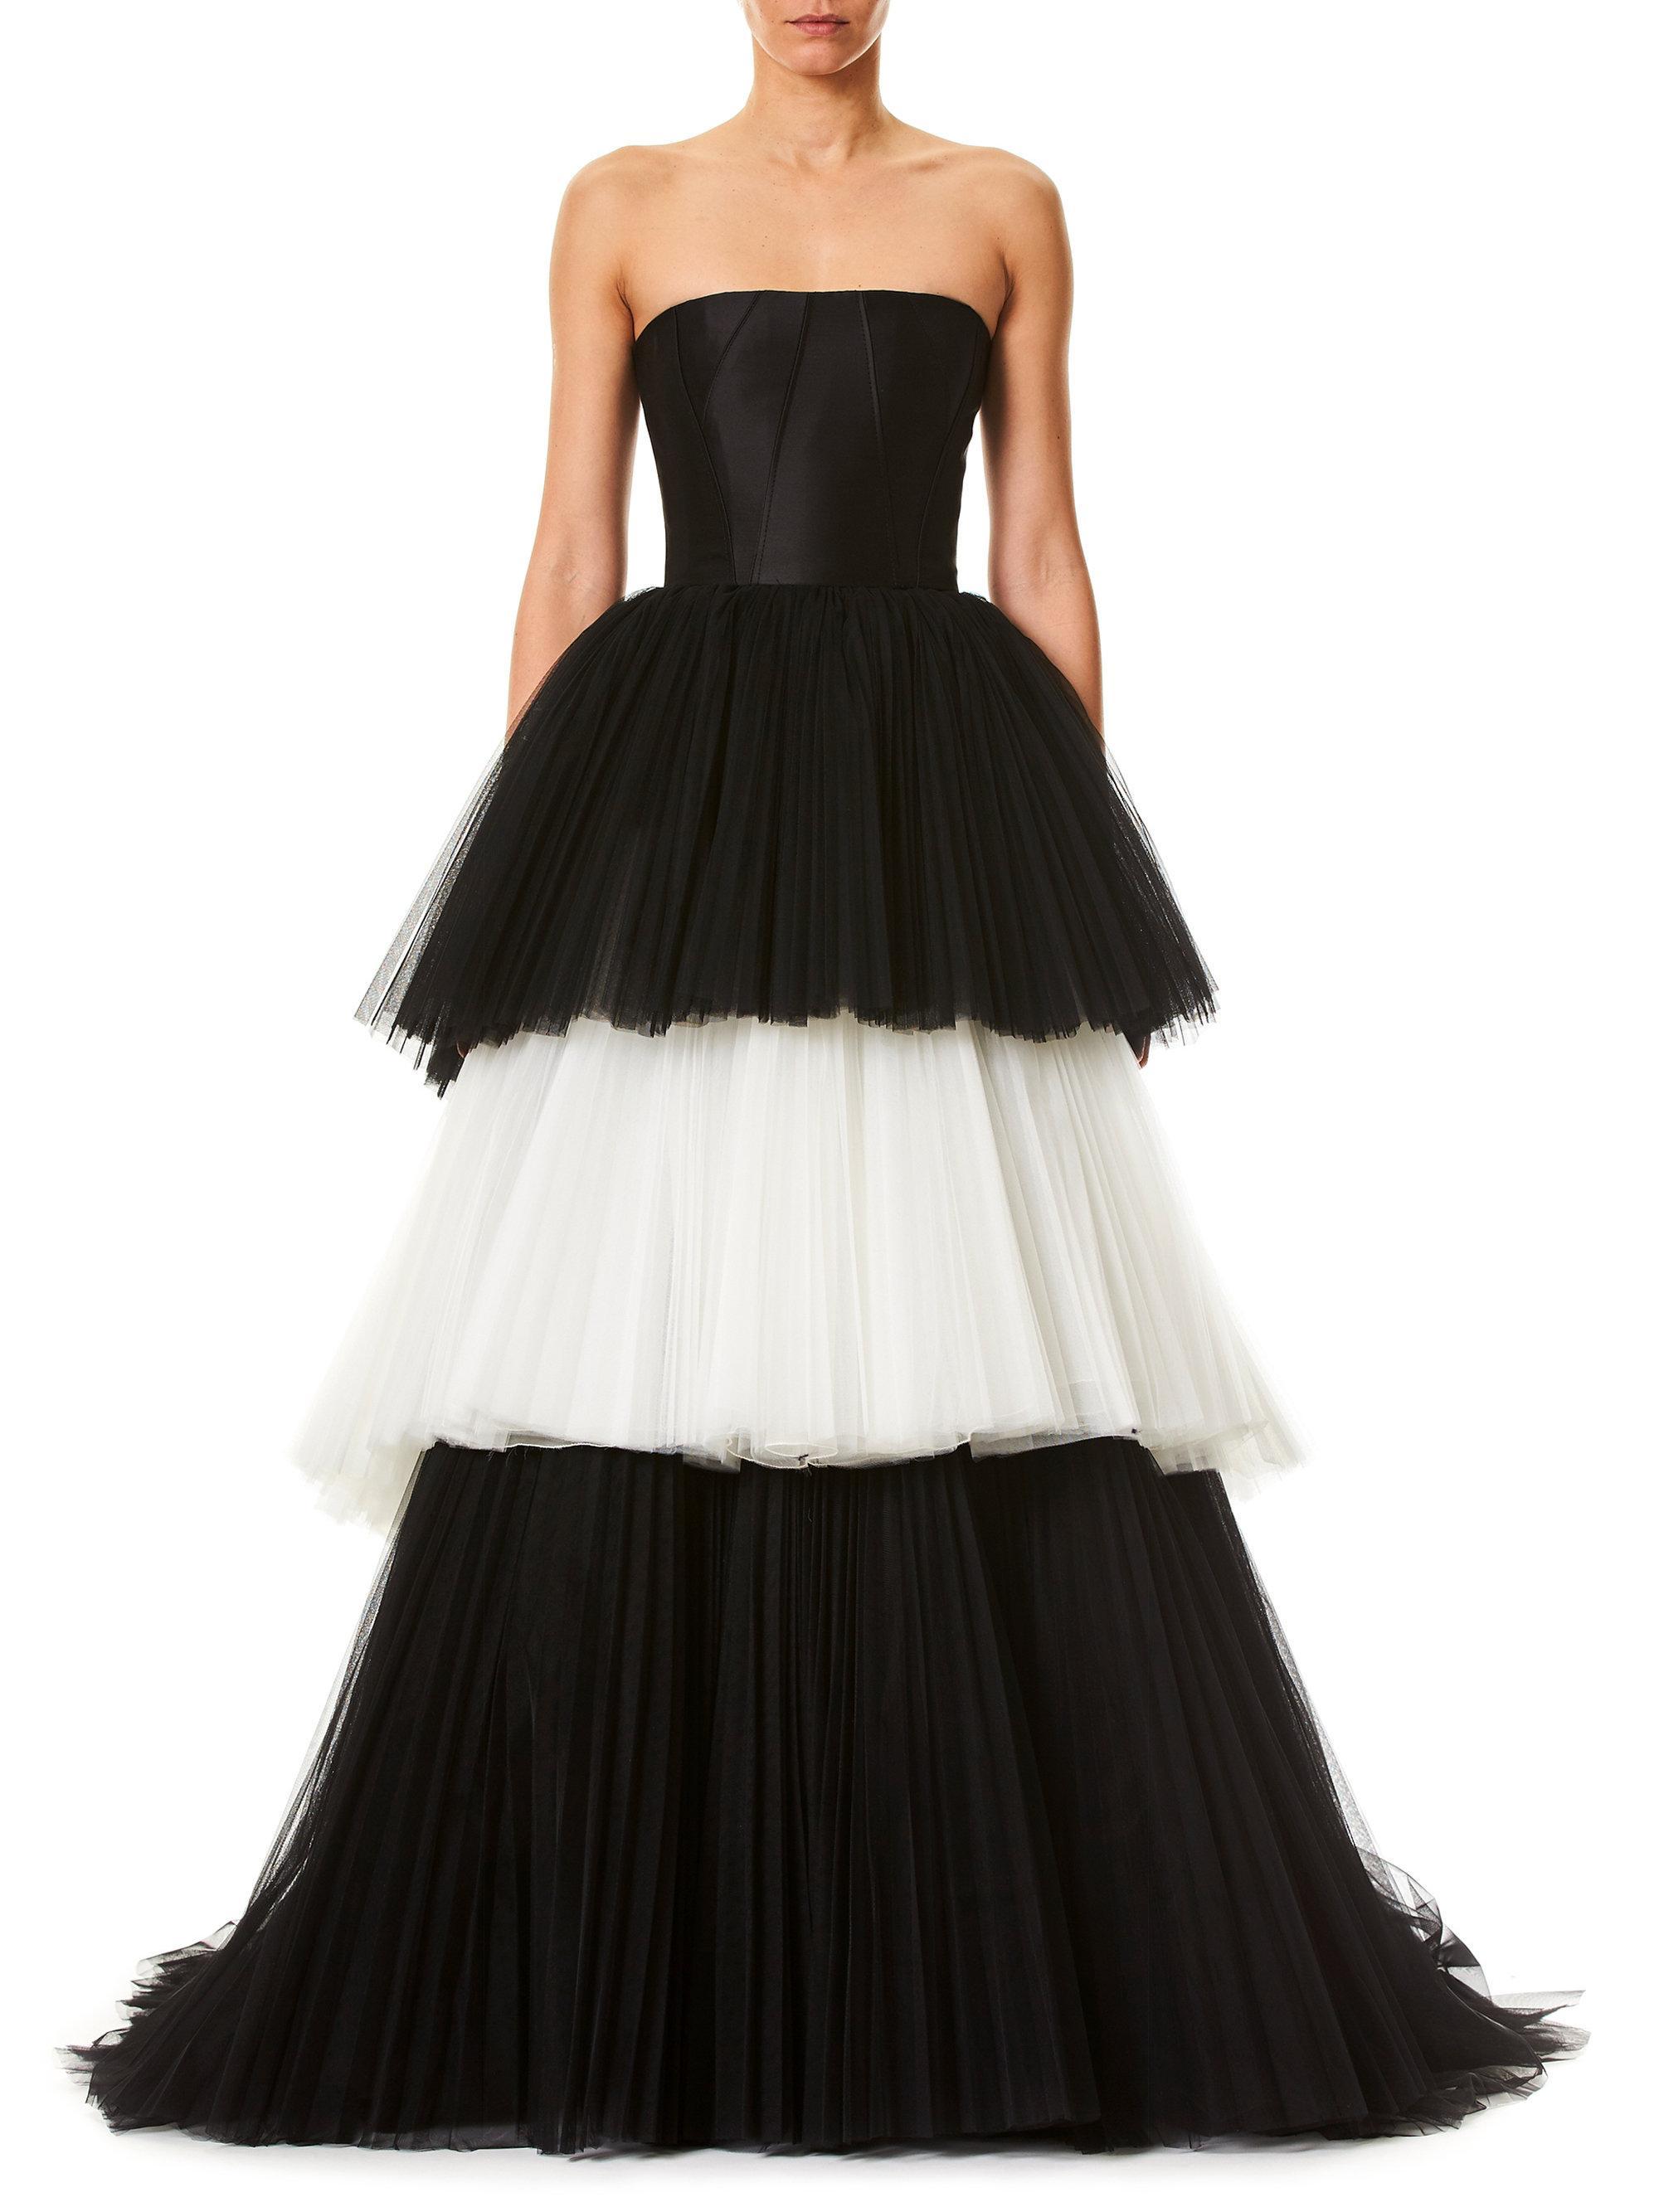 Lyst - Carolina Herrera Strapless Tulle Ball Gown in Black